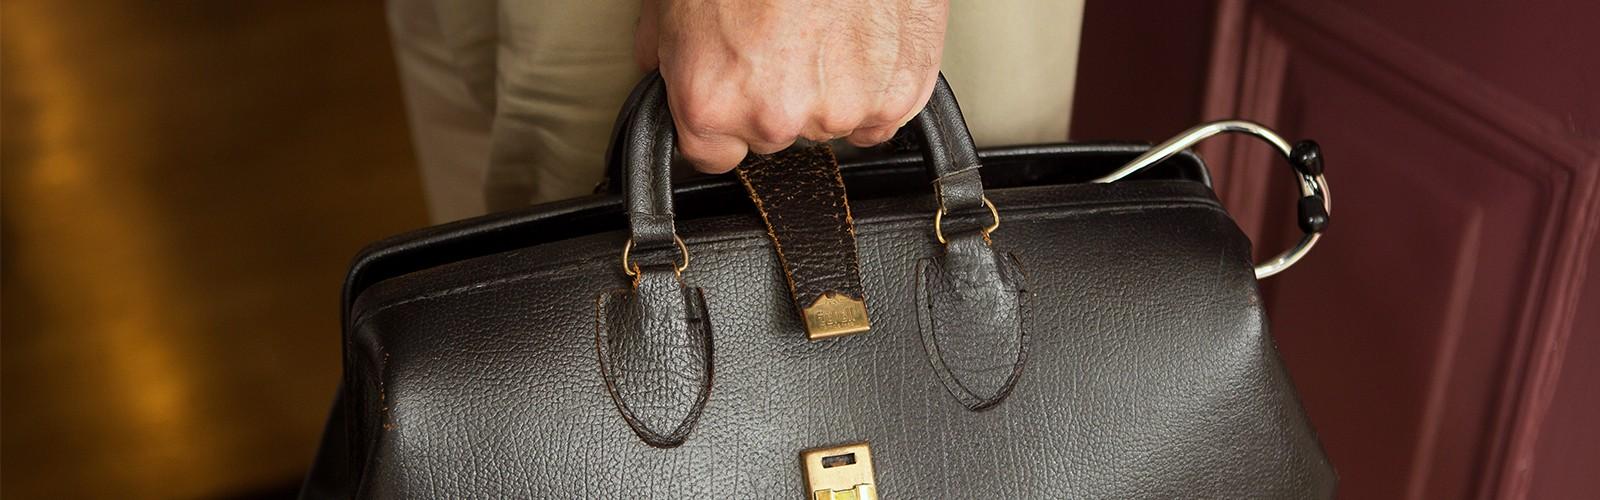 Doctor's Bag for Home Visit, Concierge Medicine in Weston & Boston MA